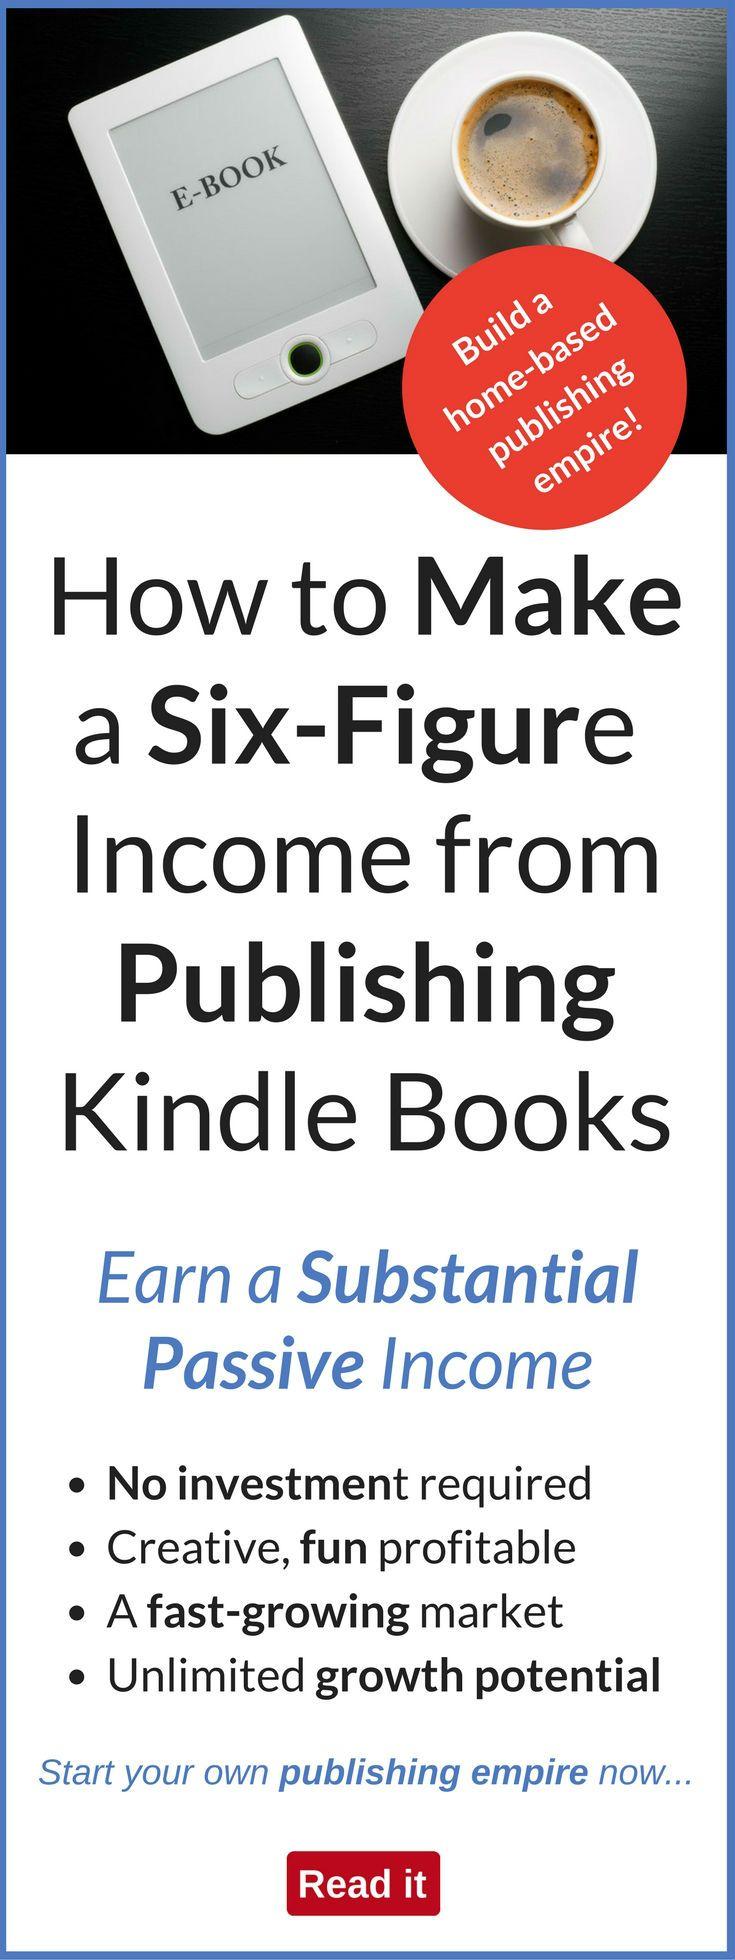 How To Make A Sixfigure Passive Income From Publishing Kindle Books